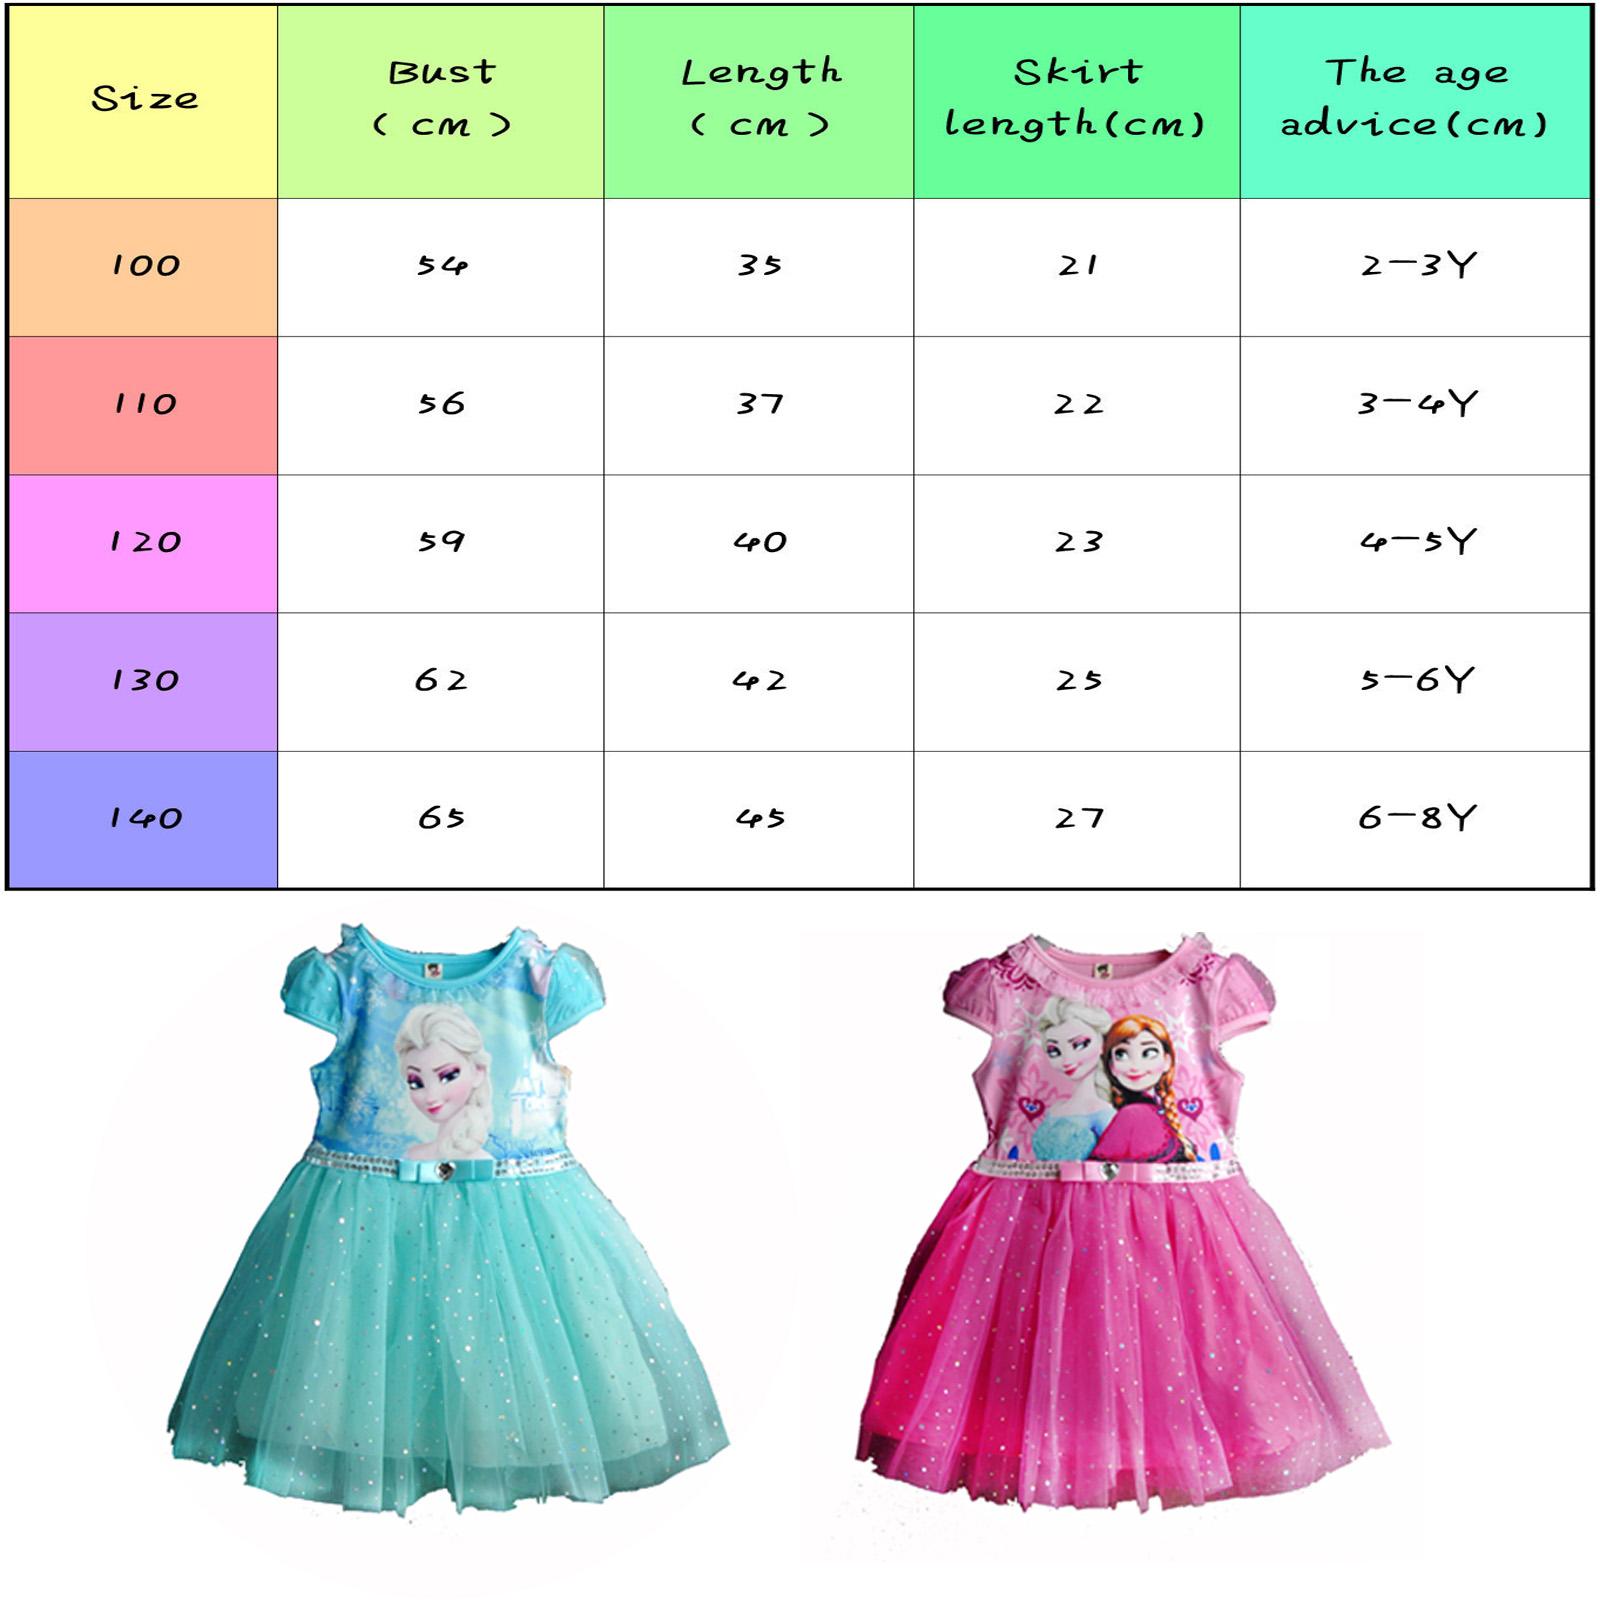 Baby Girls Disney Frozen Princess Elsa Anna Tutu Dress Party Fancy Costumes 2 8Y